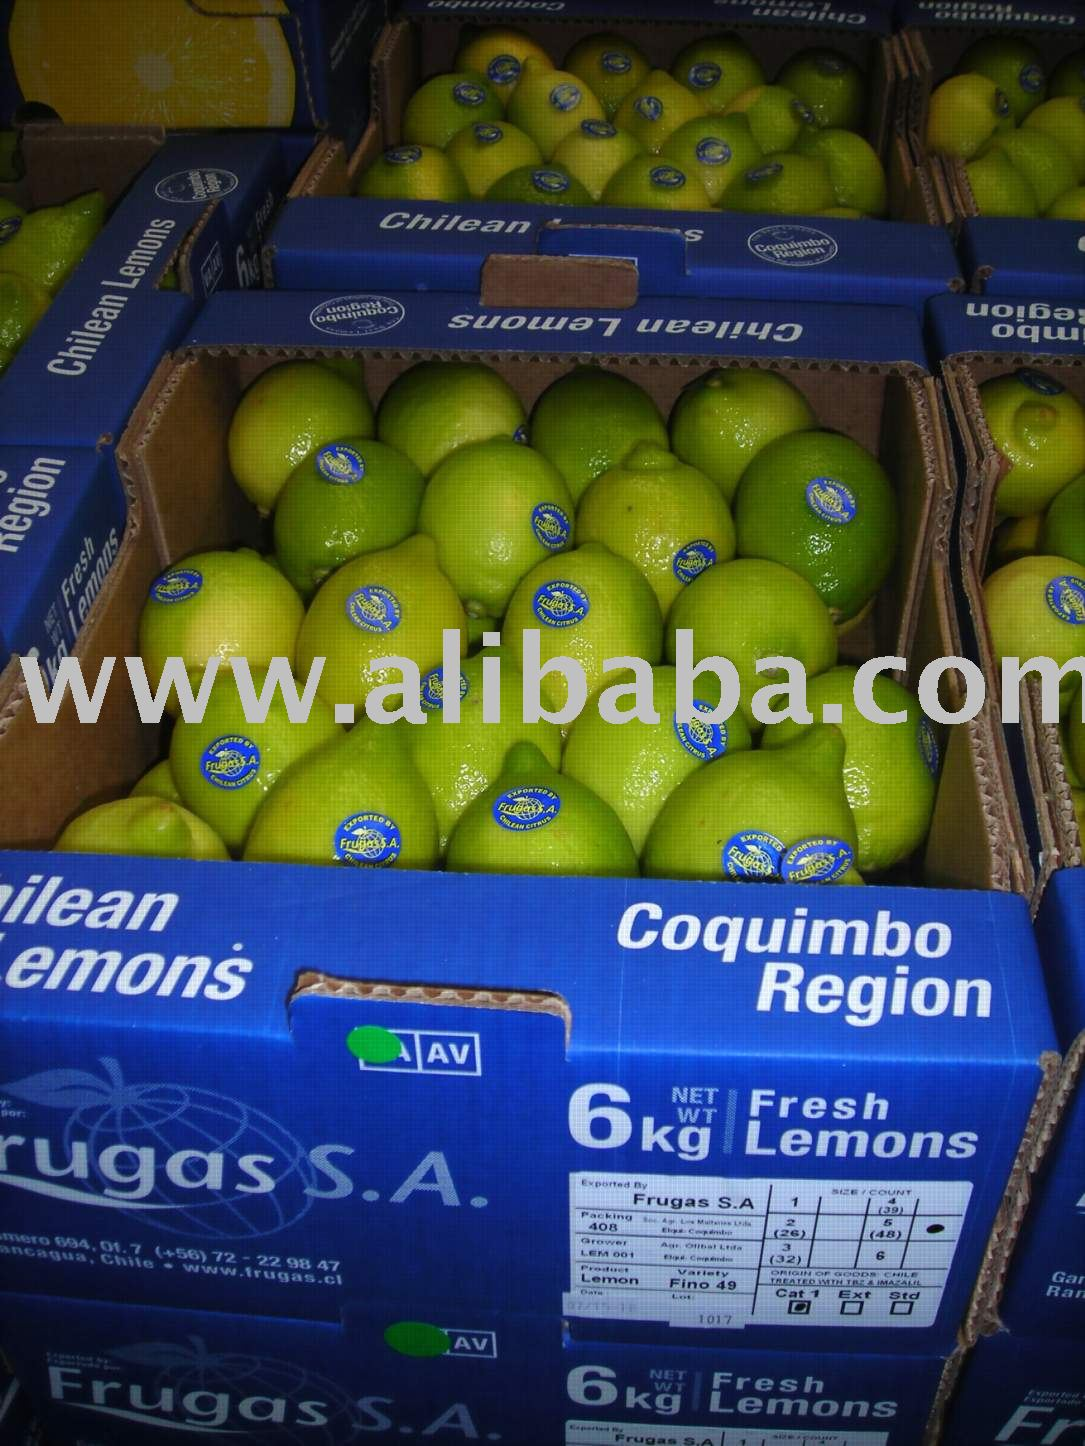 Kiwi Fruits 3 2 Kg Products Chile Kiwi Fruits 3 2 Kg Supplier